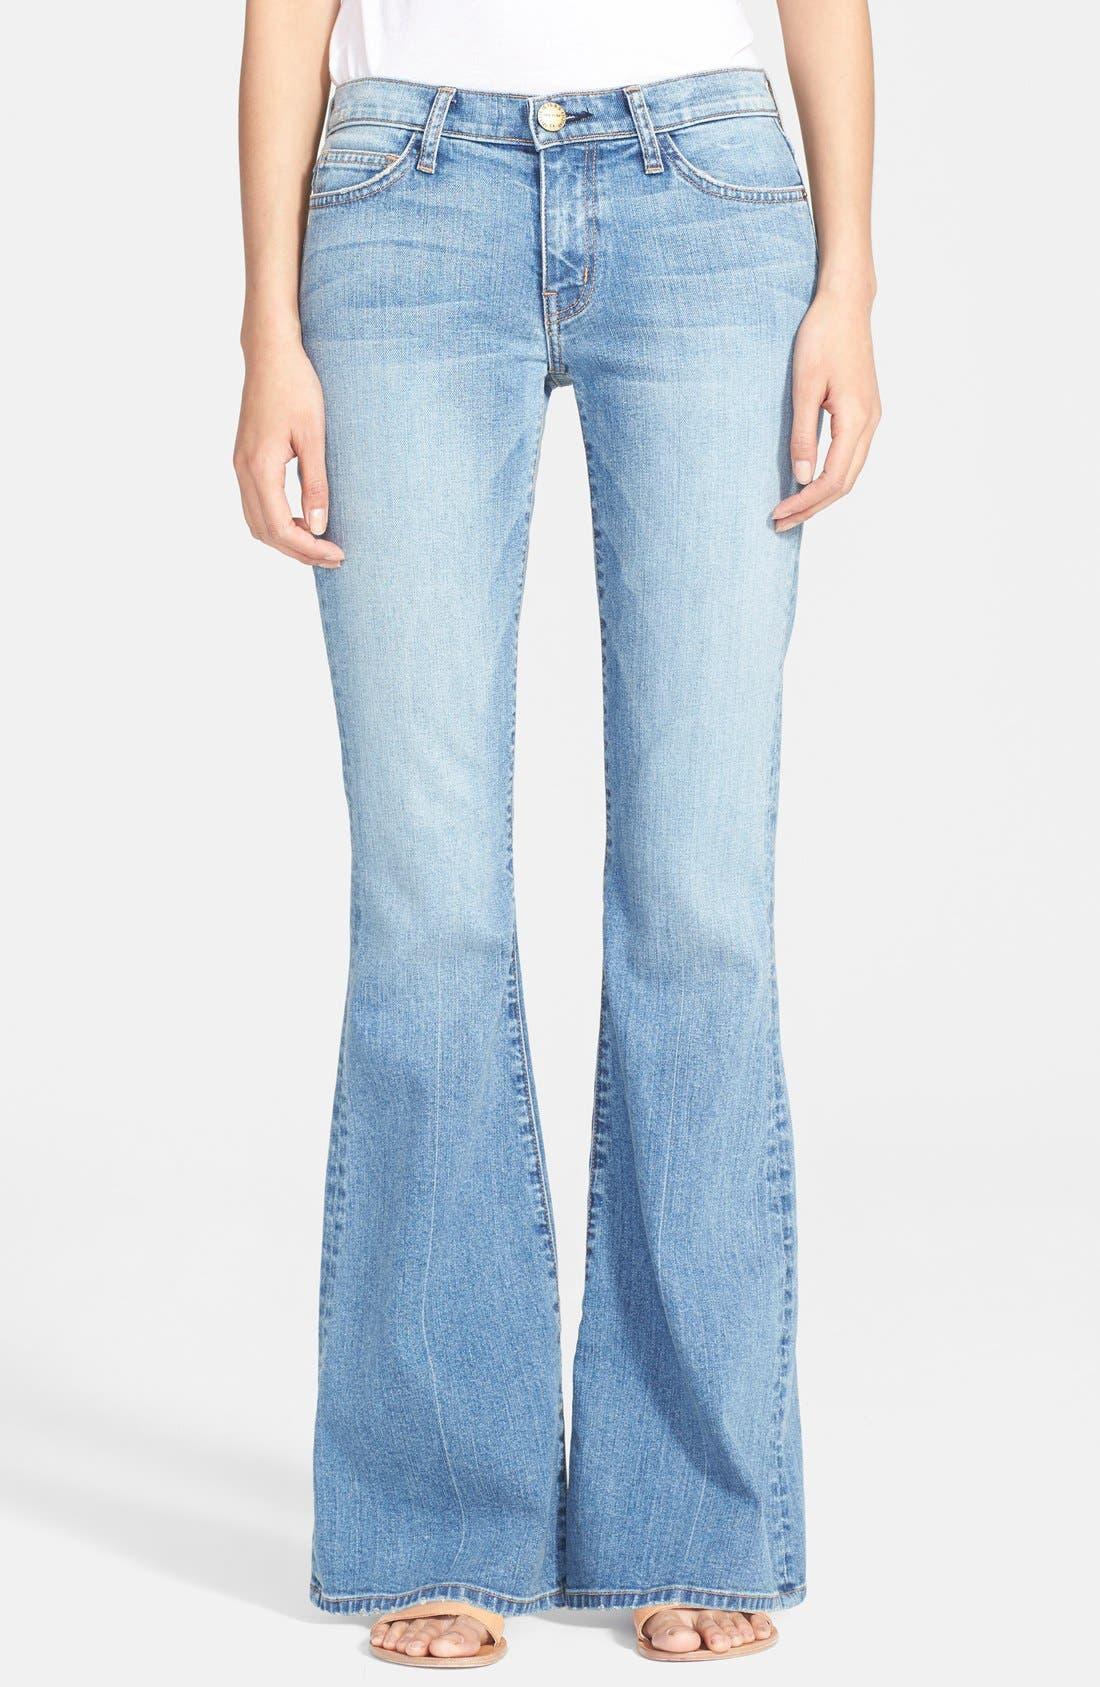 Main Image - Current/Elliott Bell Bottom Jeans (Heirloom)